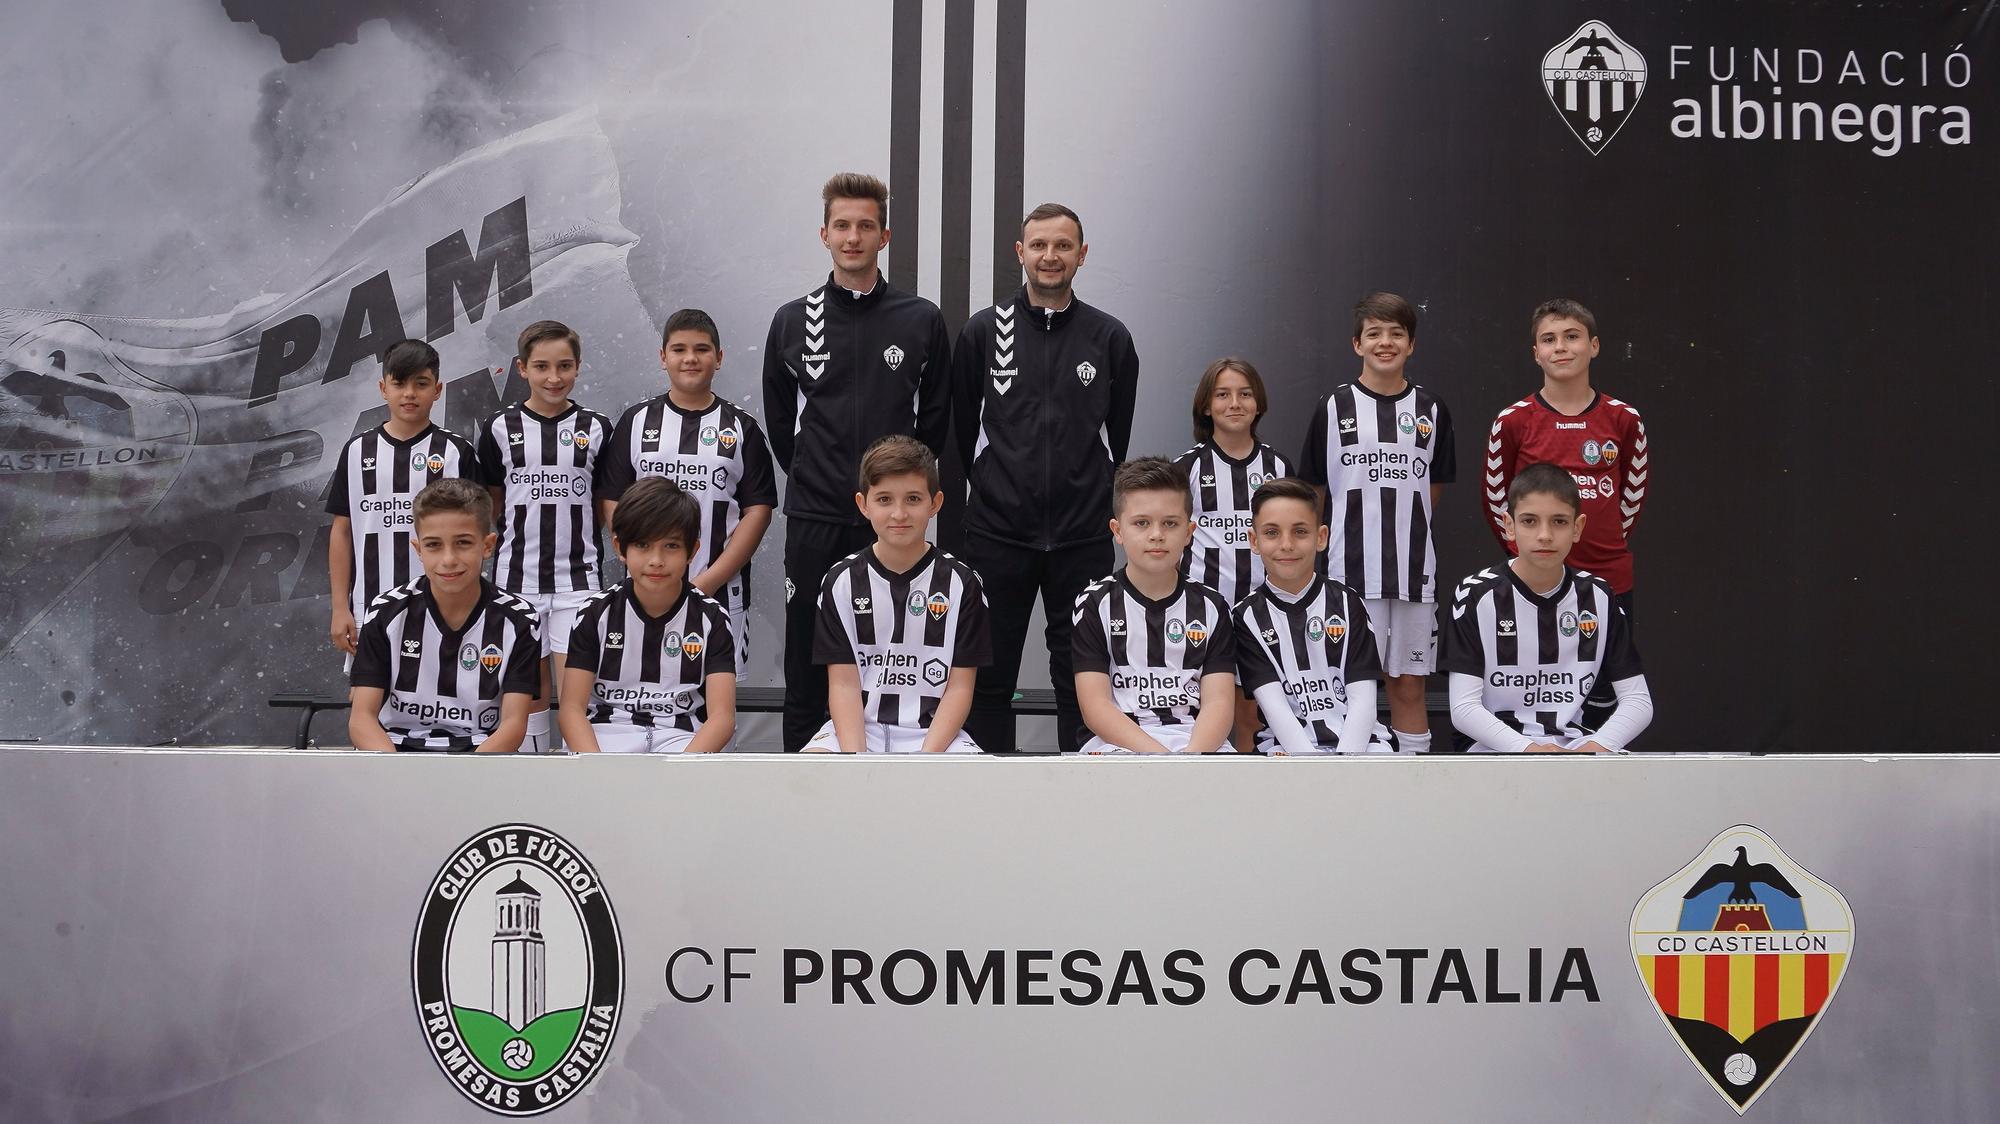 Alev�n C Promesas Castalia.jpg